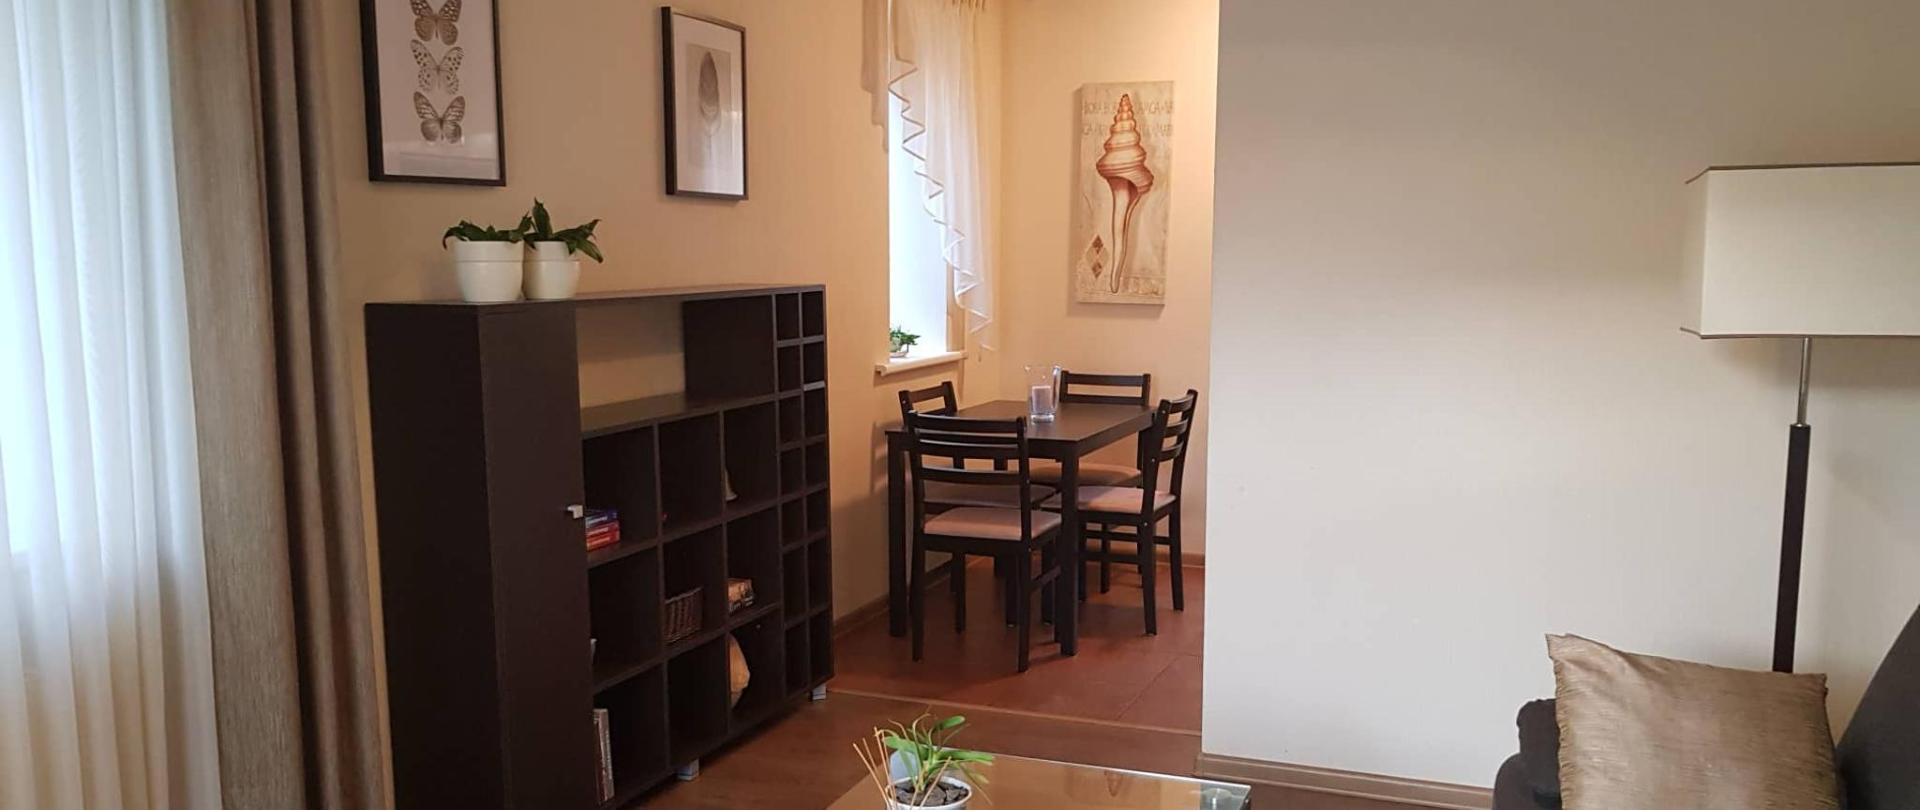 Apartamentai Vytauto Street